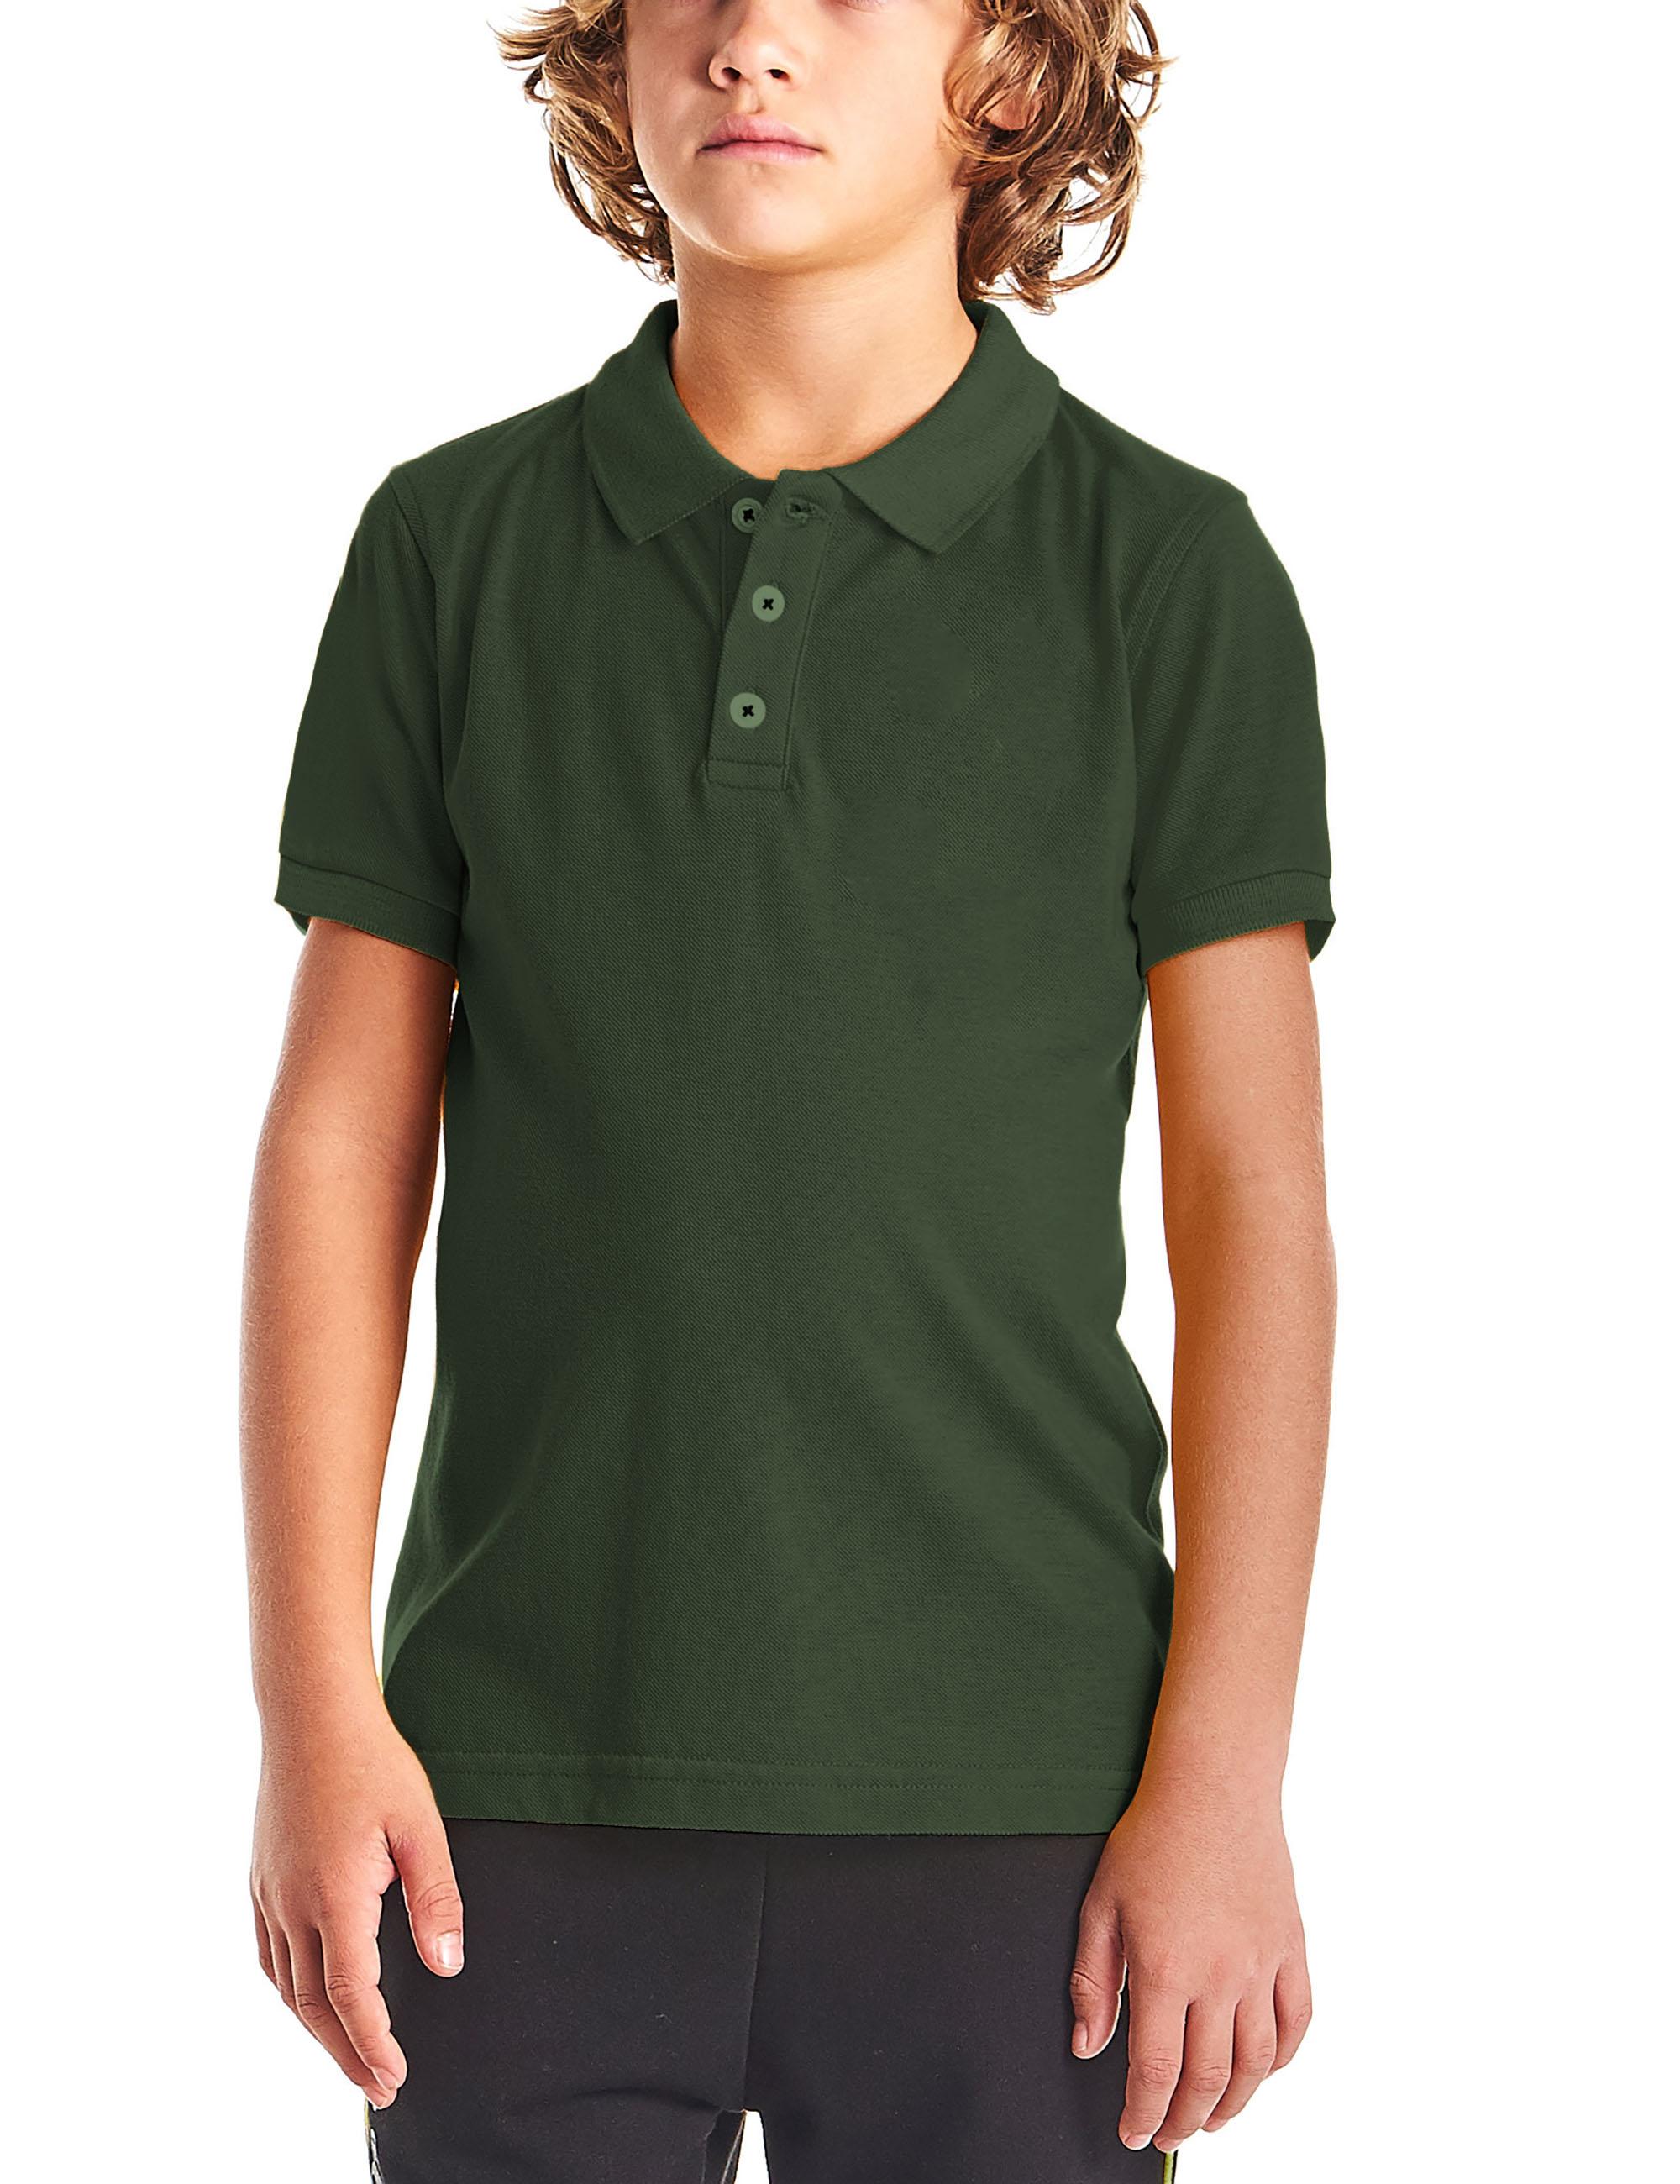 Kids Pique Polo Shirt Solid Plain Short Sleeve Uniform Regular Fit